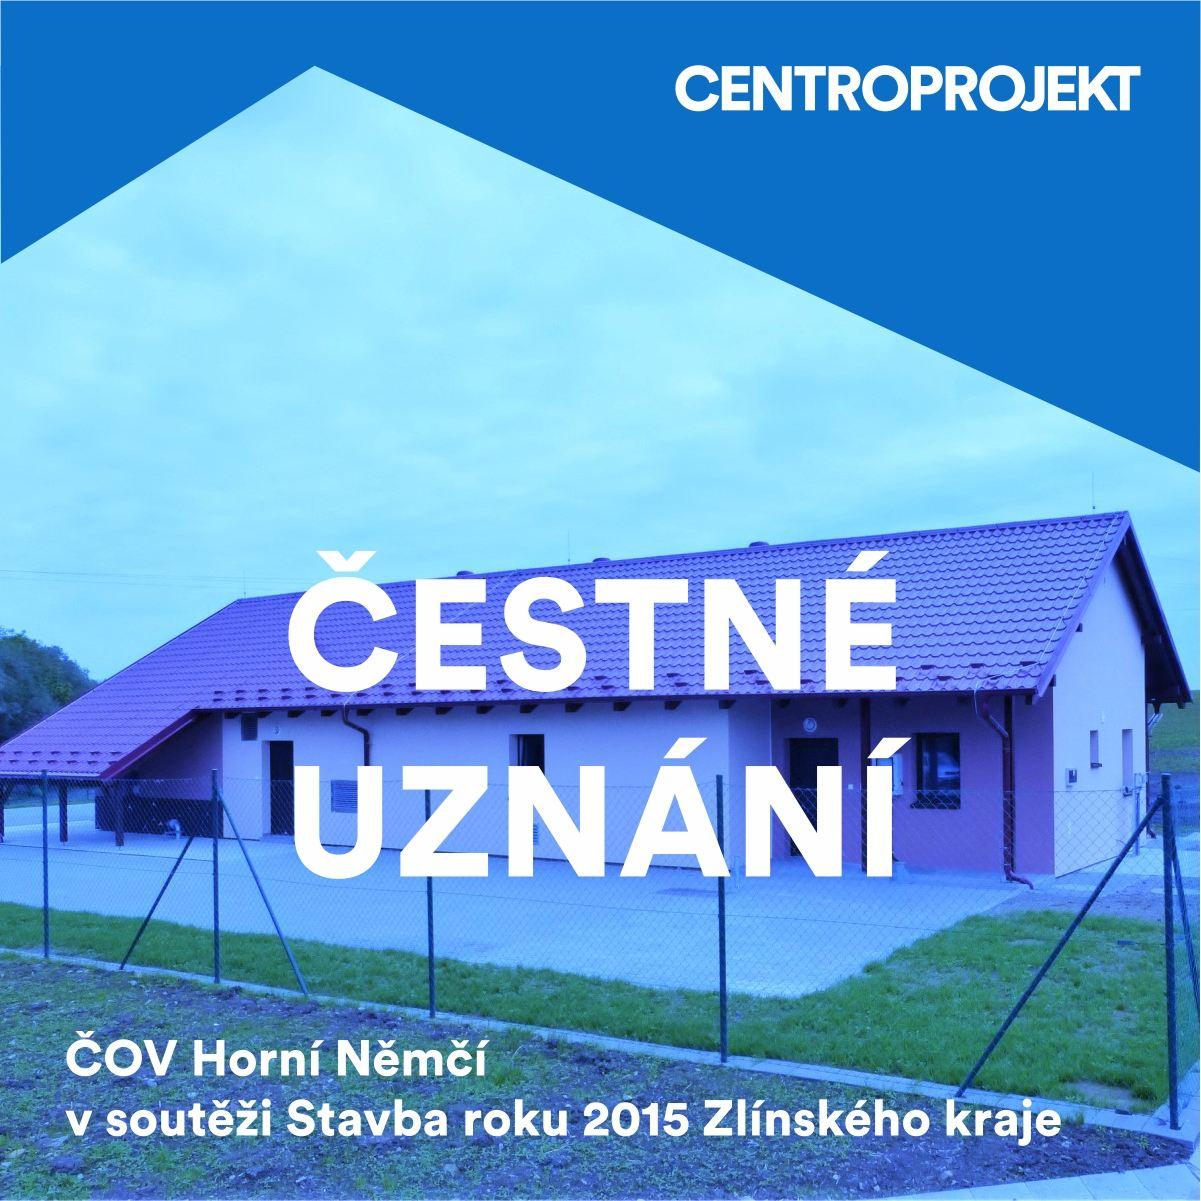 02_stavba-roku-zlinskeho-kraje_centroprojekt